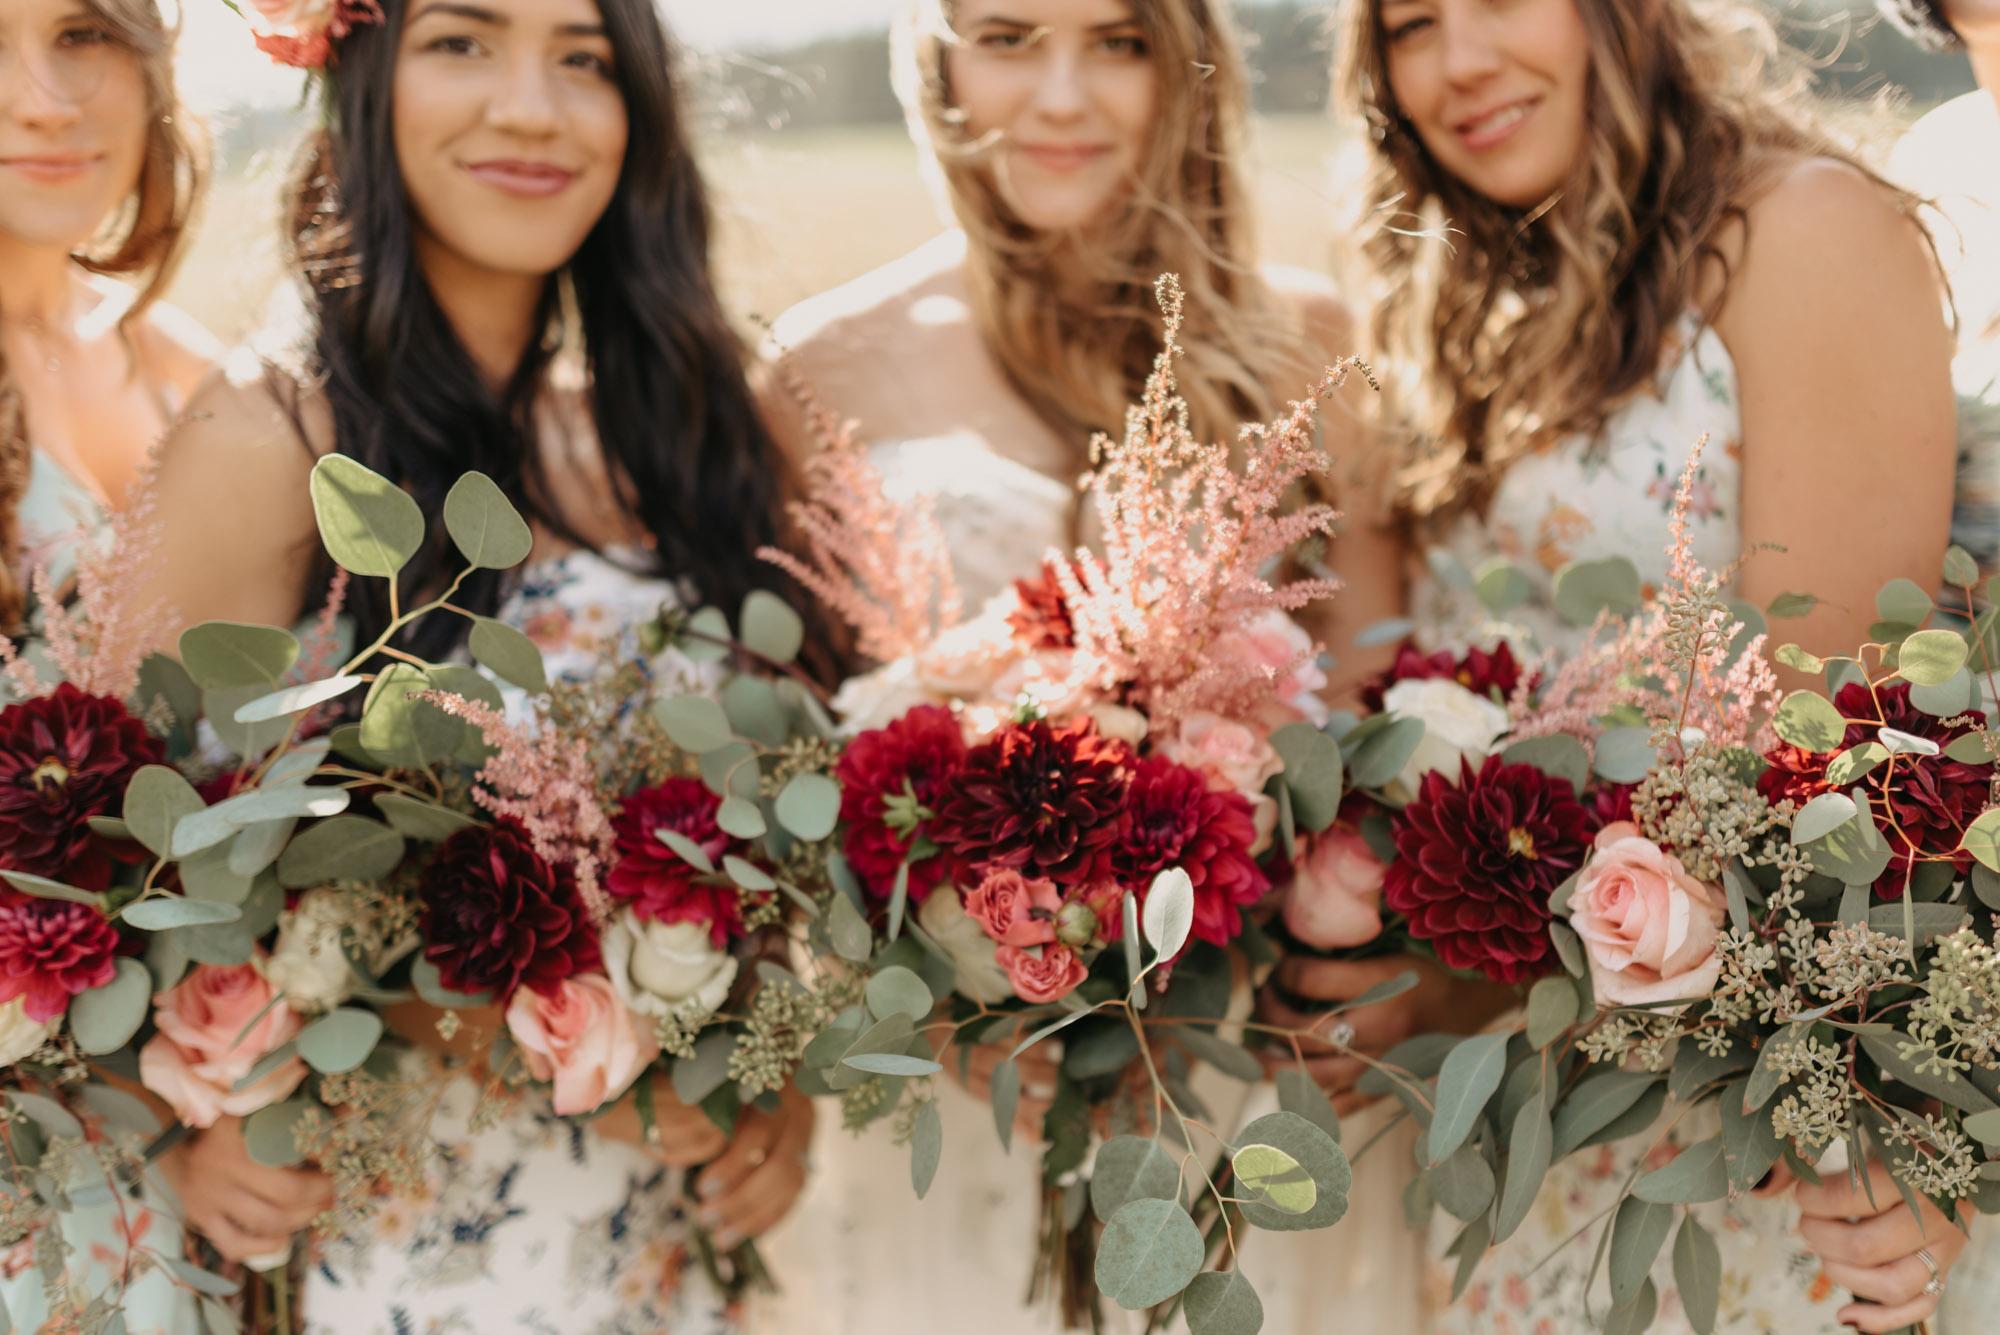 Bridal-Party-Free-People-Flower-Dresses-Washington-Wedding-8499.jpg